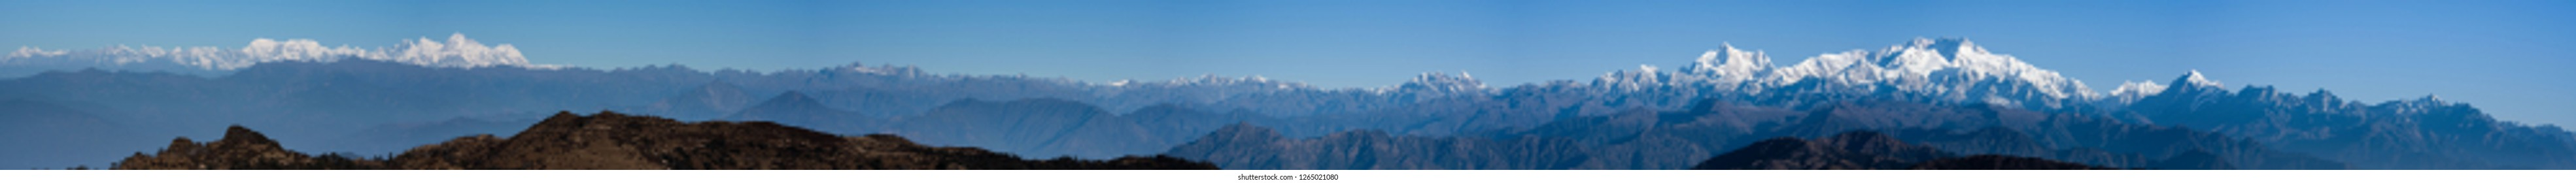 Panoramic view of himalayas mountains, Mount Everest and Kanchenjunga peak viewed from Sandakphu, Dajeeling, India